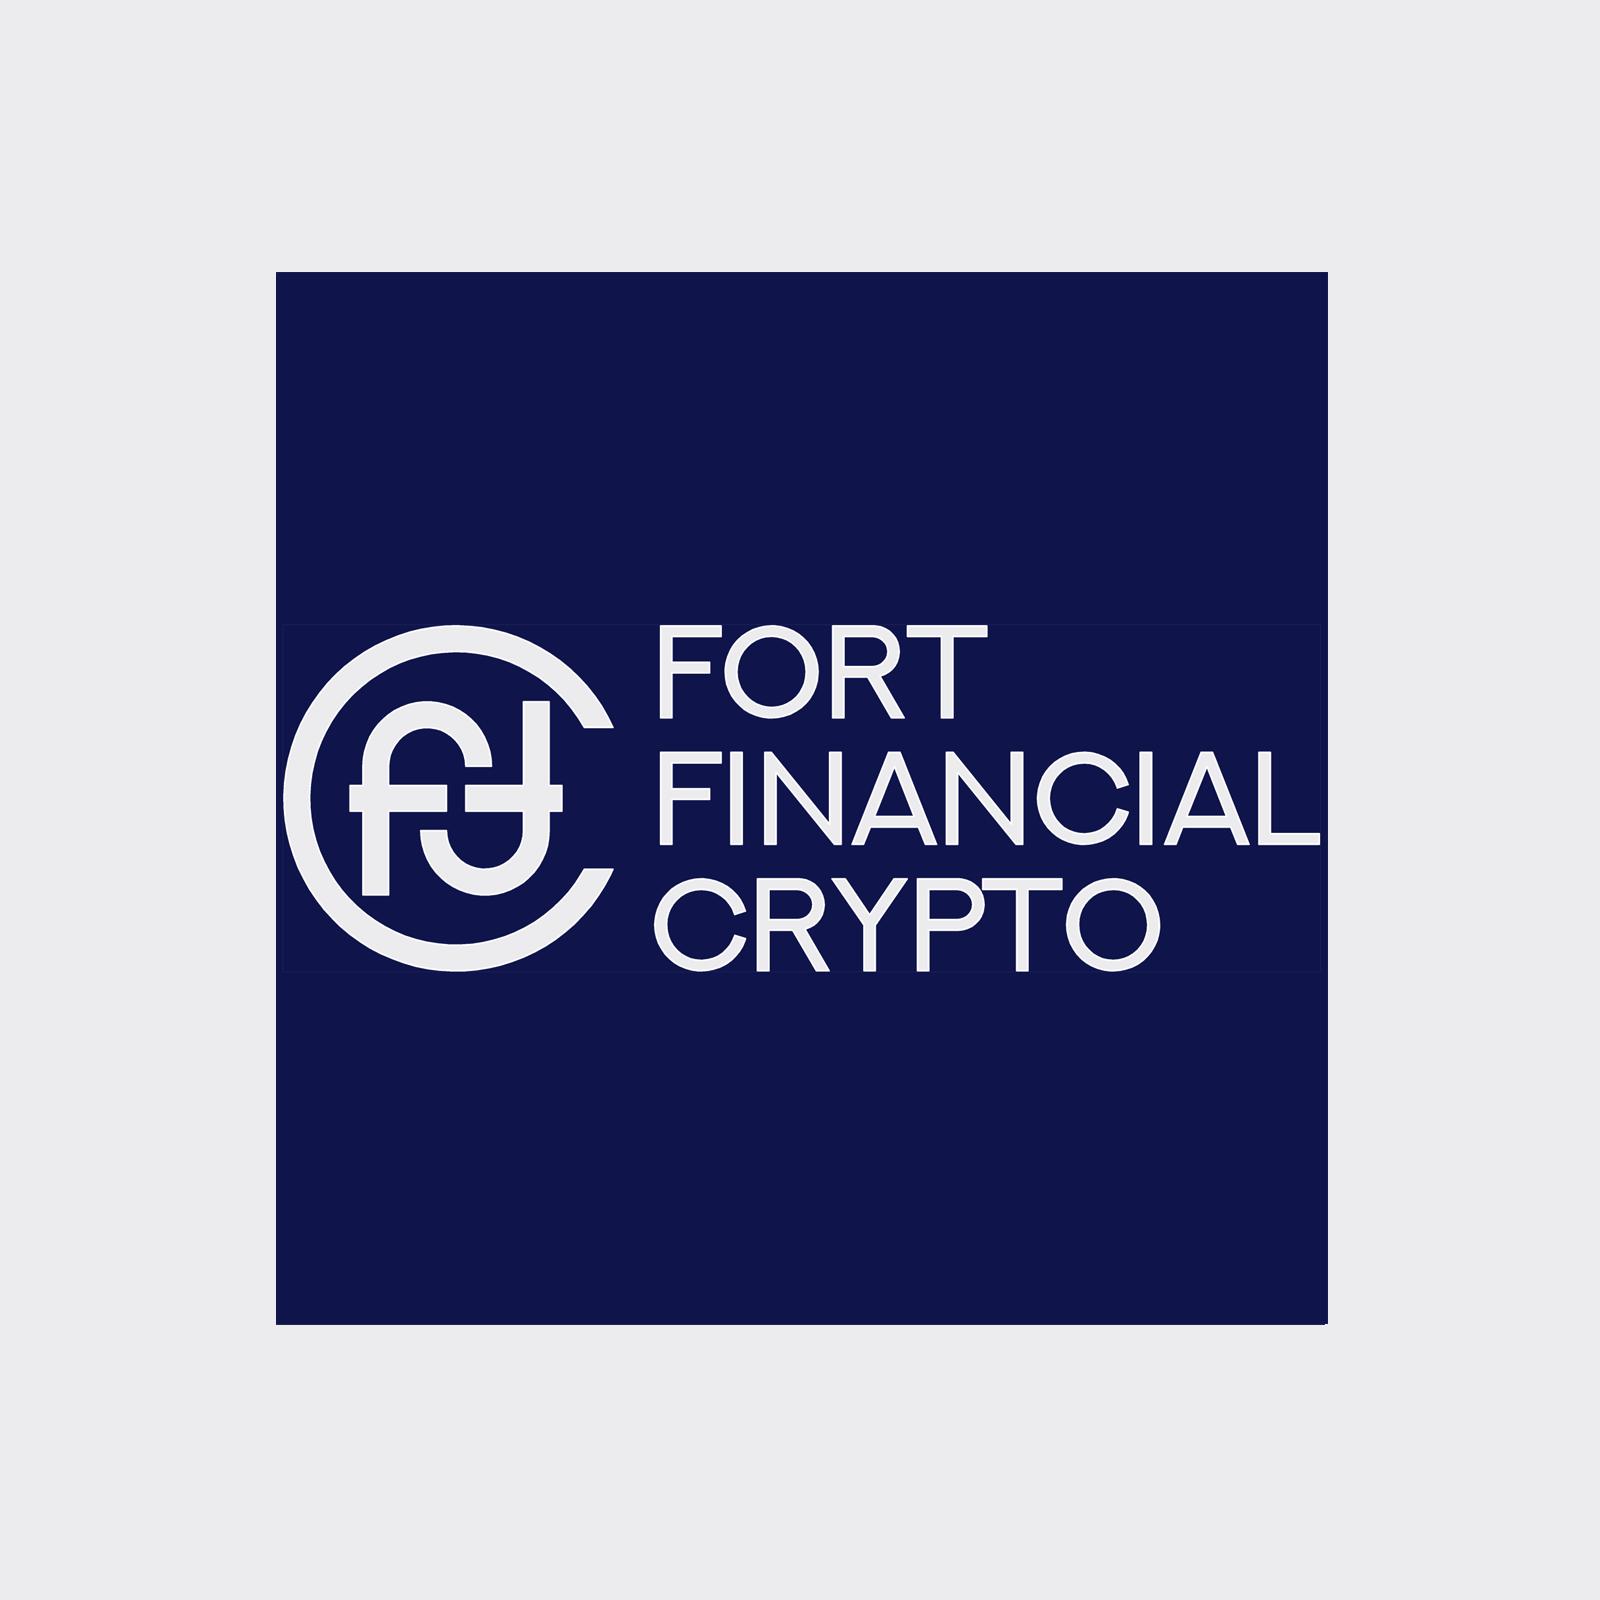 Разработка логотипа финансовой компании фото f_4595a86df3dc8244.png